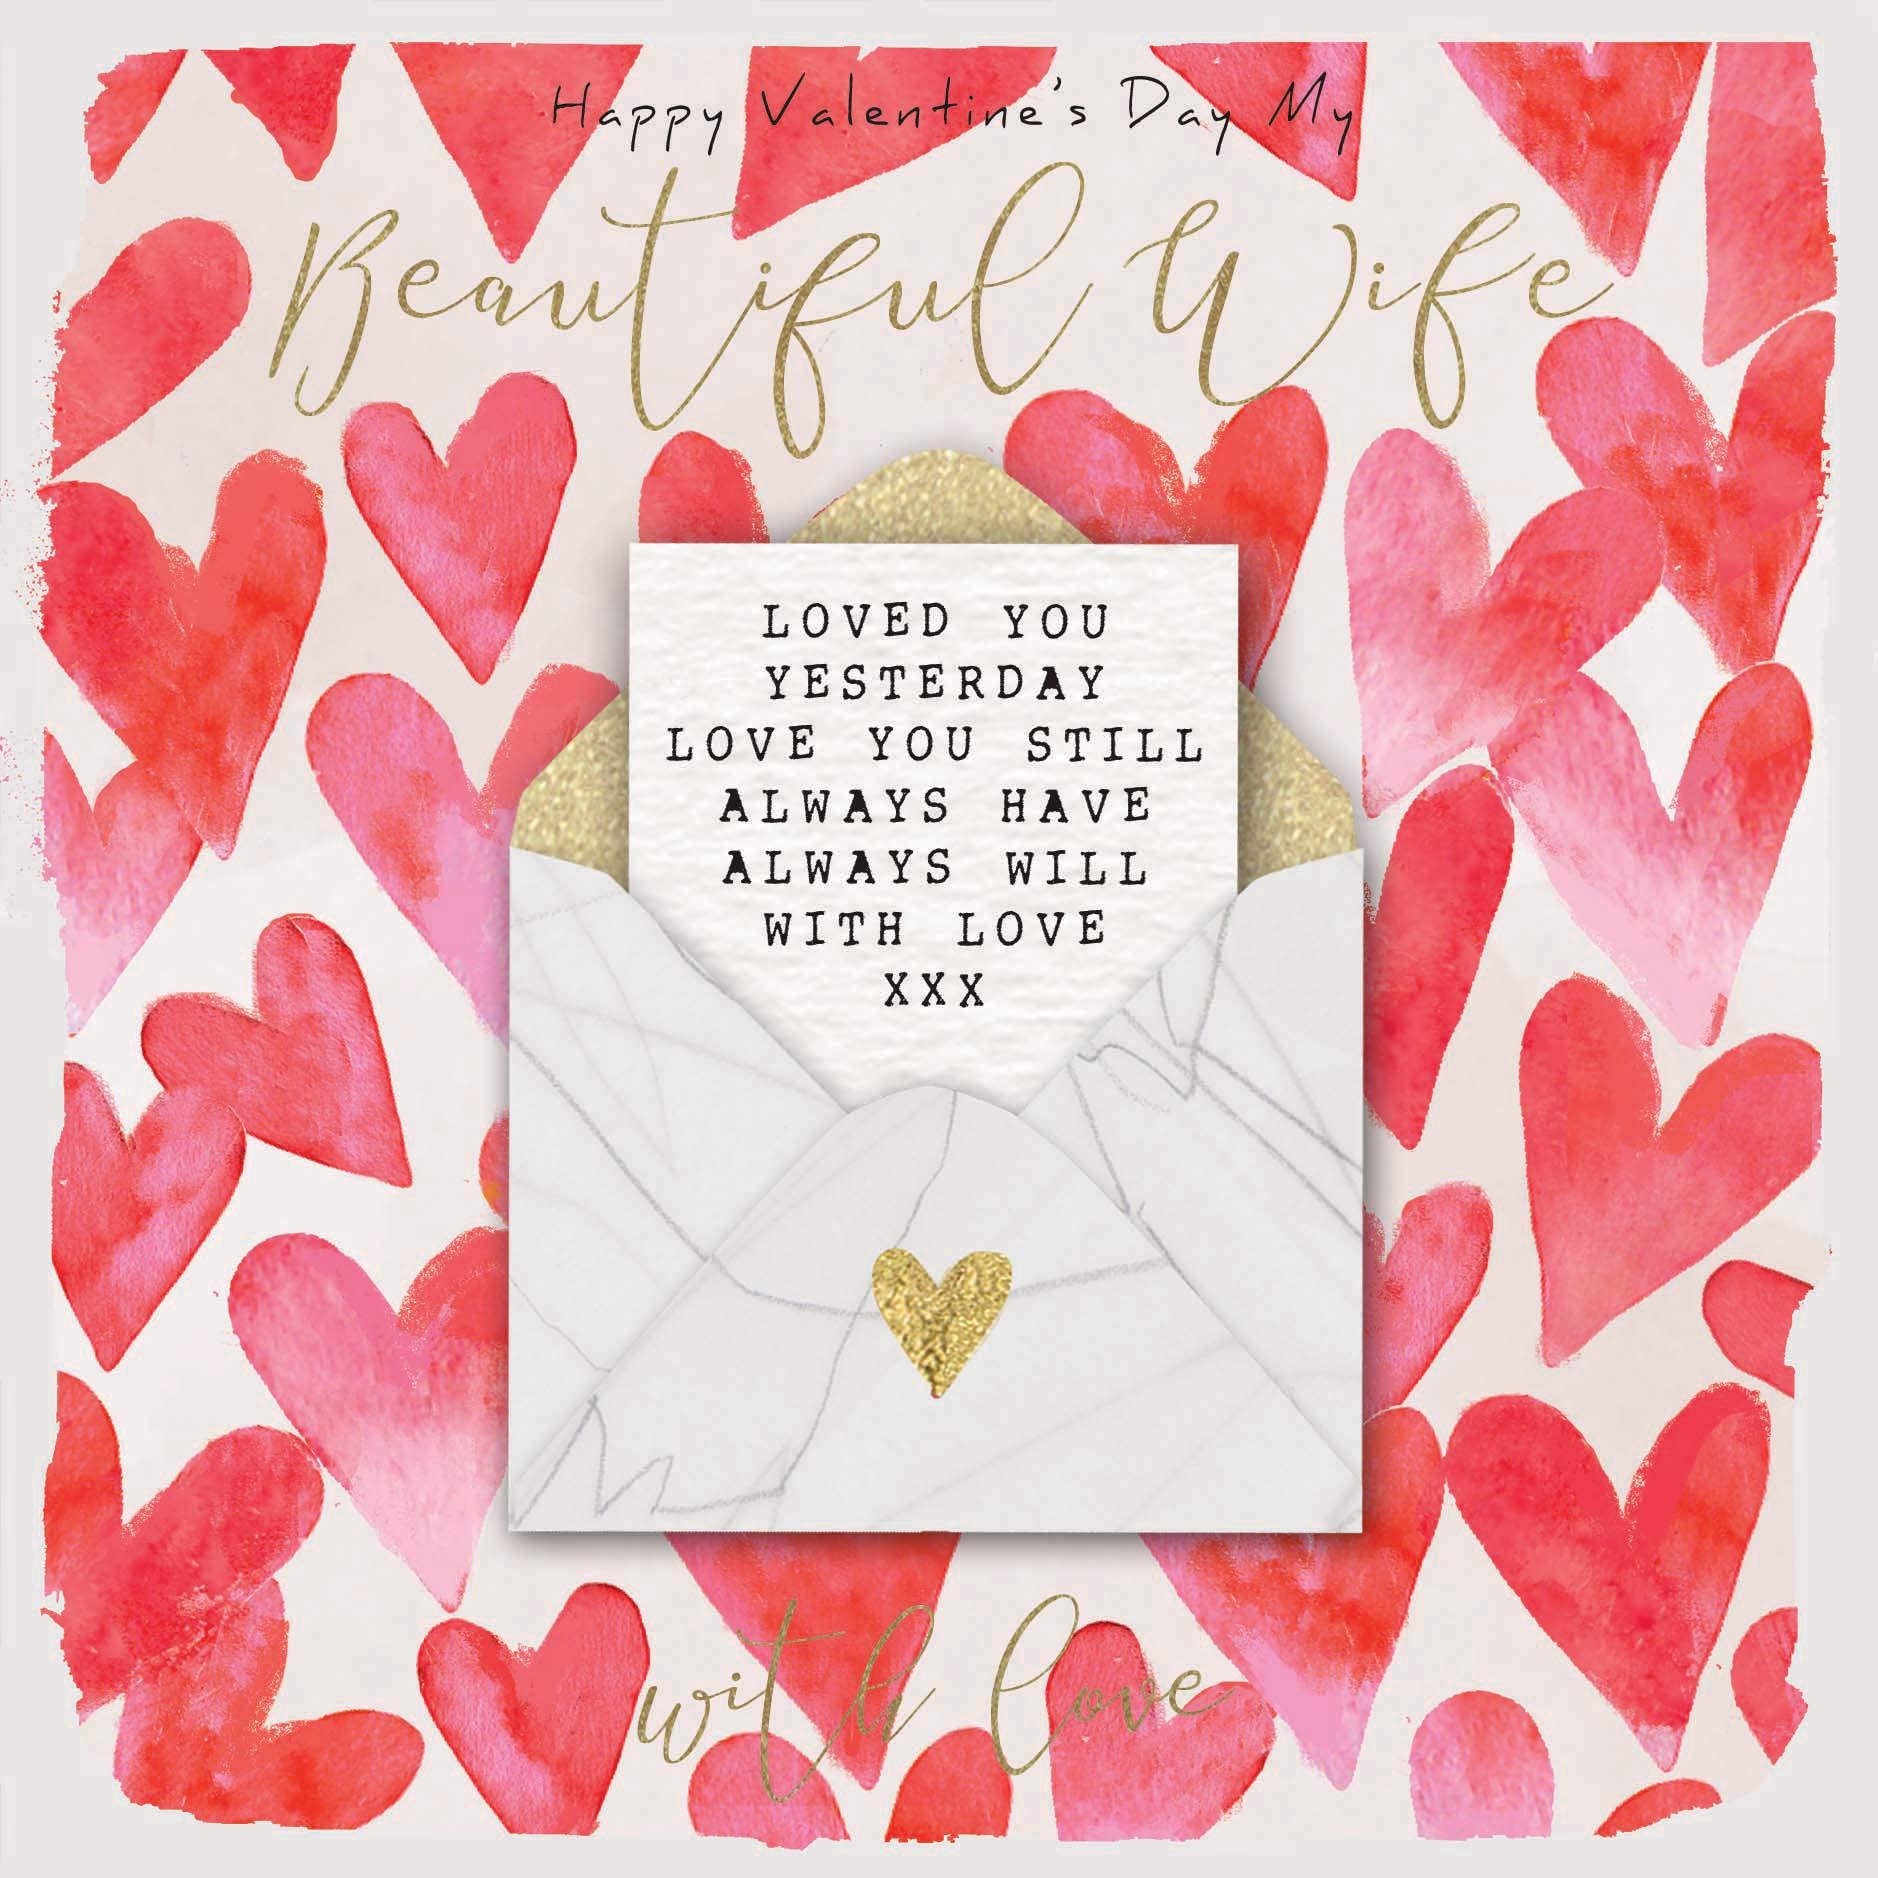 Wife to valentine note A Valentine